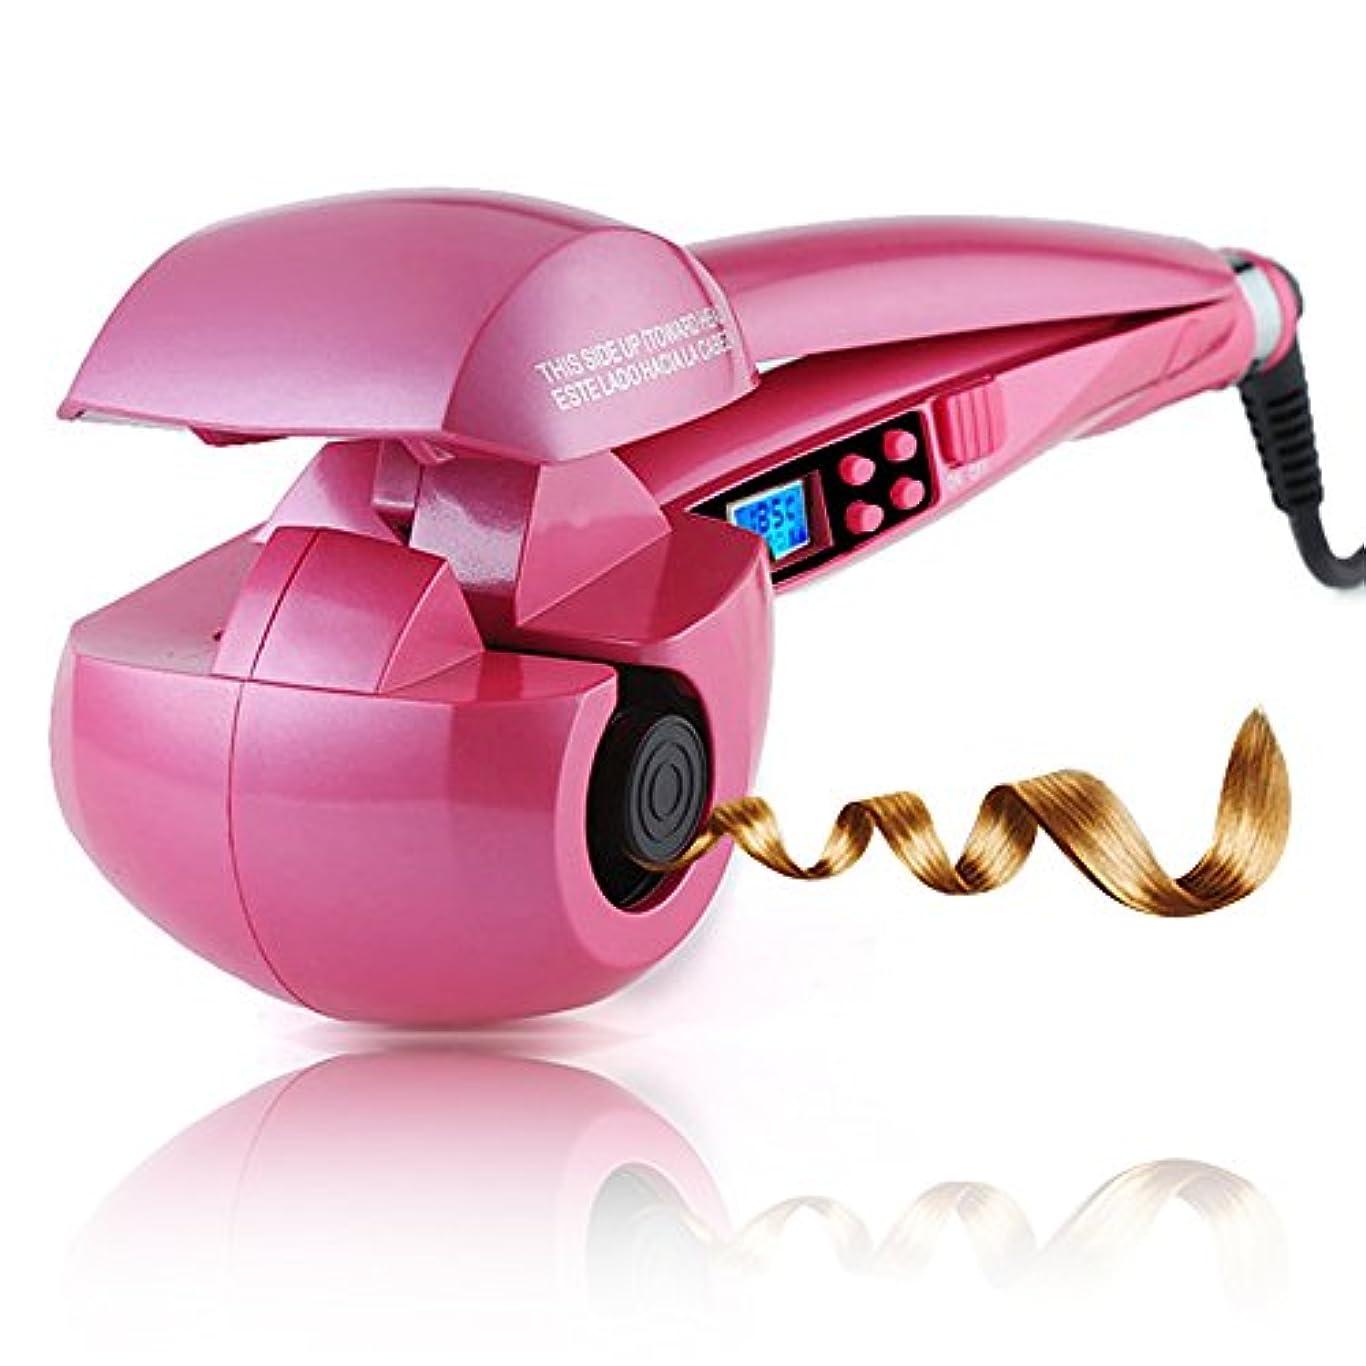 MEIKOU オートカール ヘアアイロン 8秒自動巻き ミラカール 日本語取扱説明書付き (ピンク)